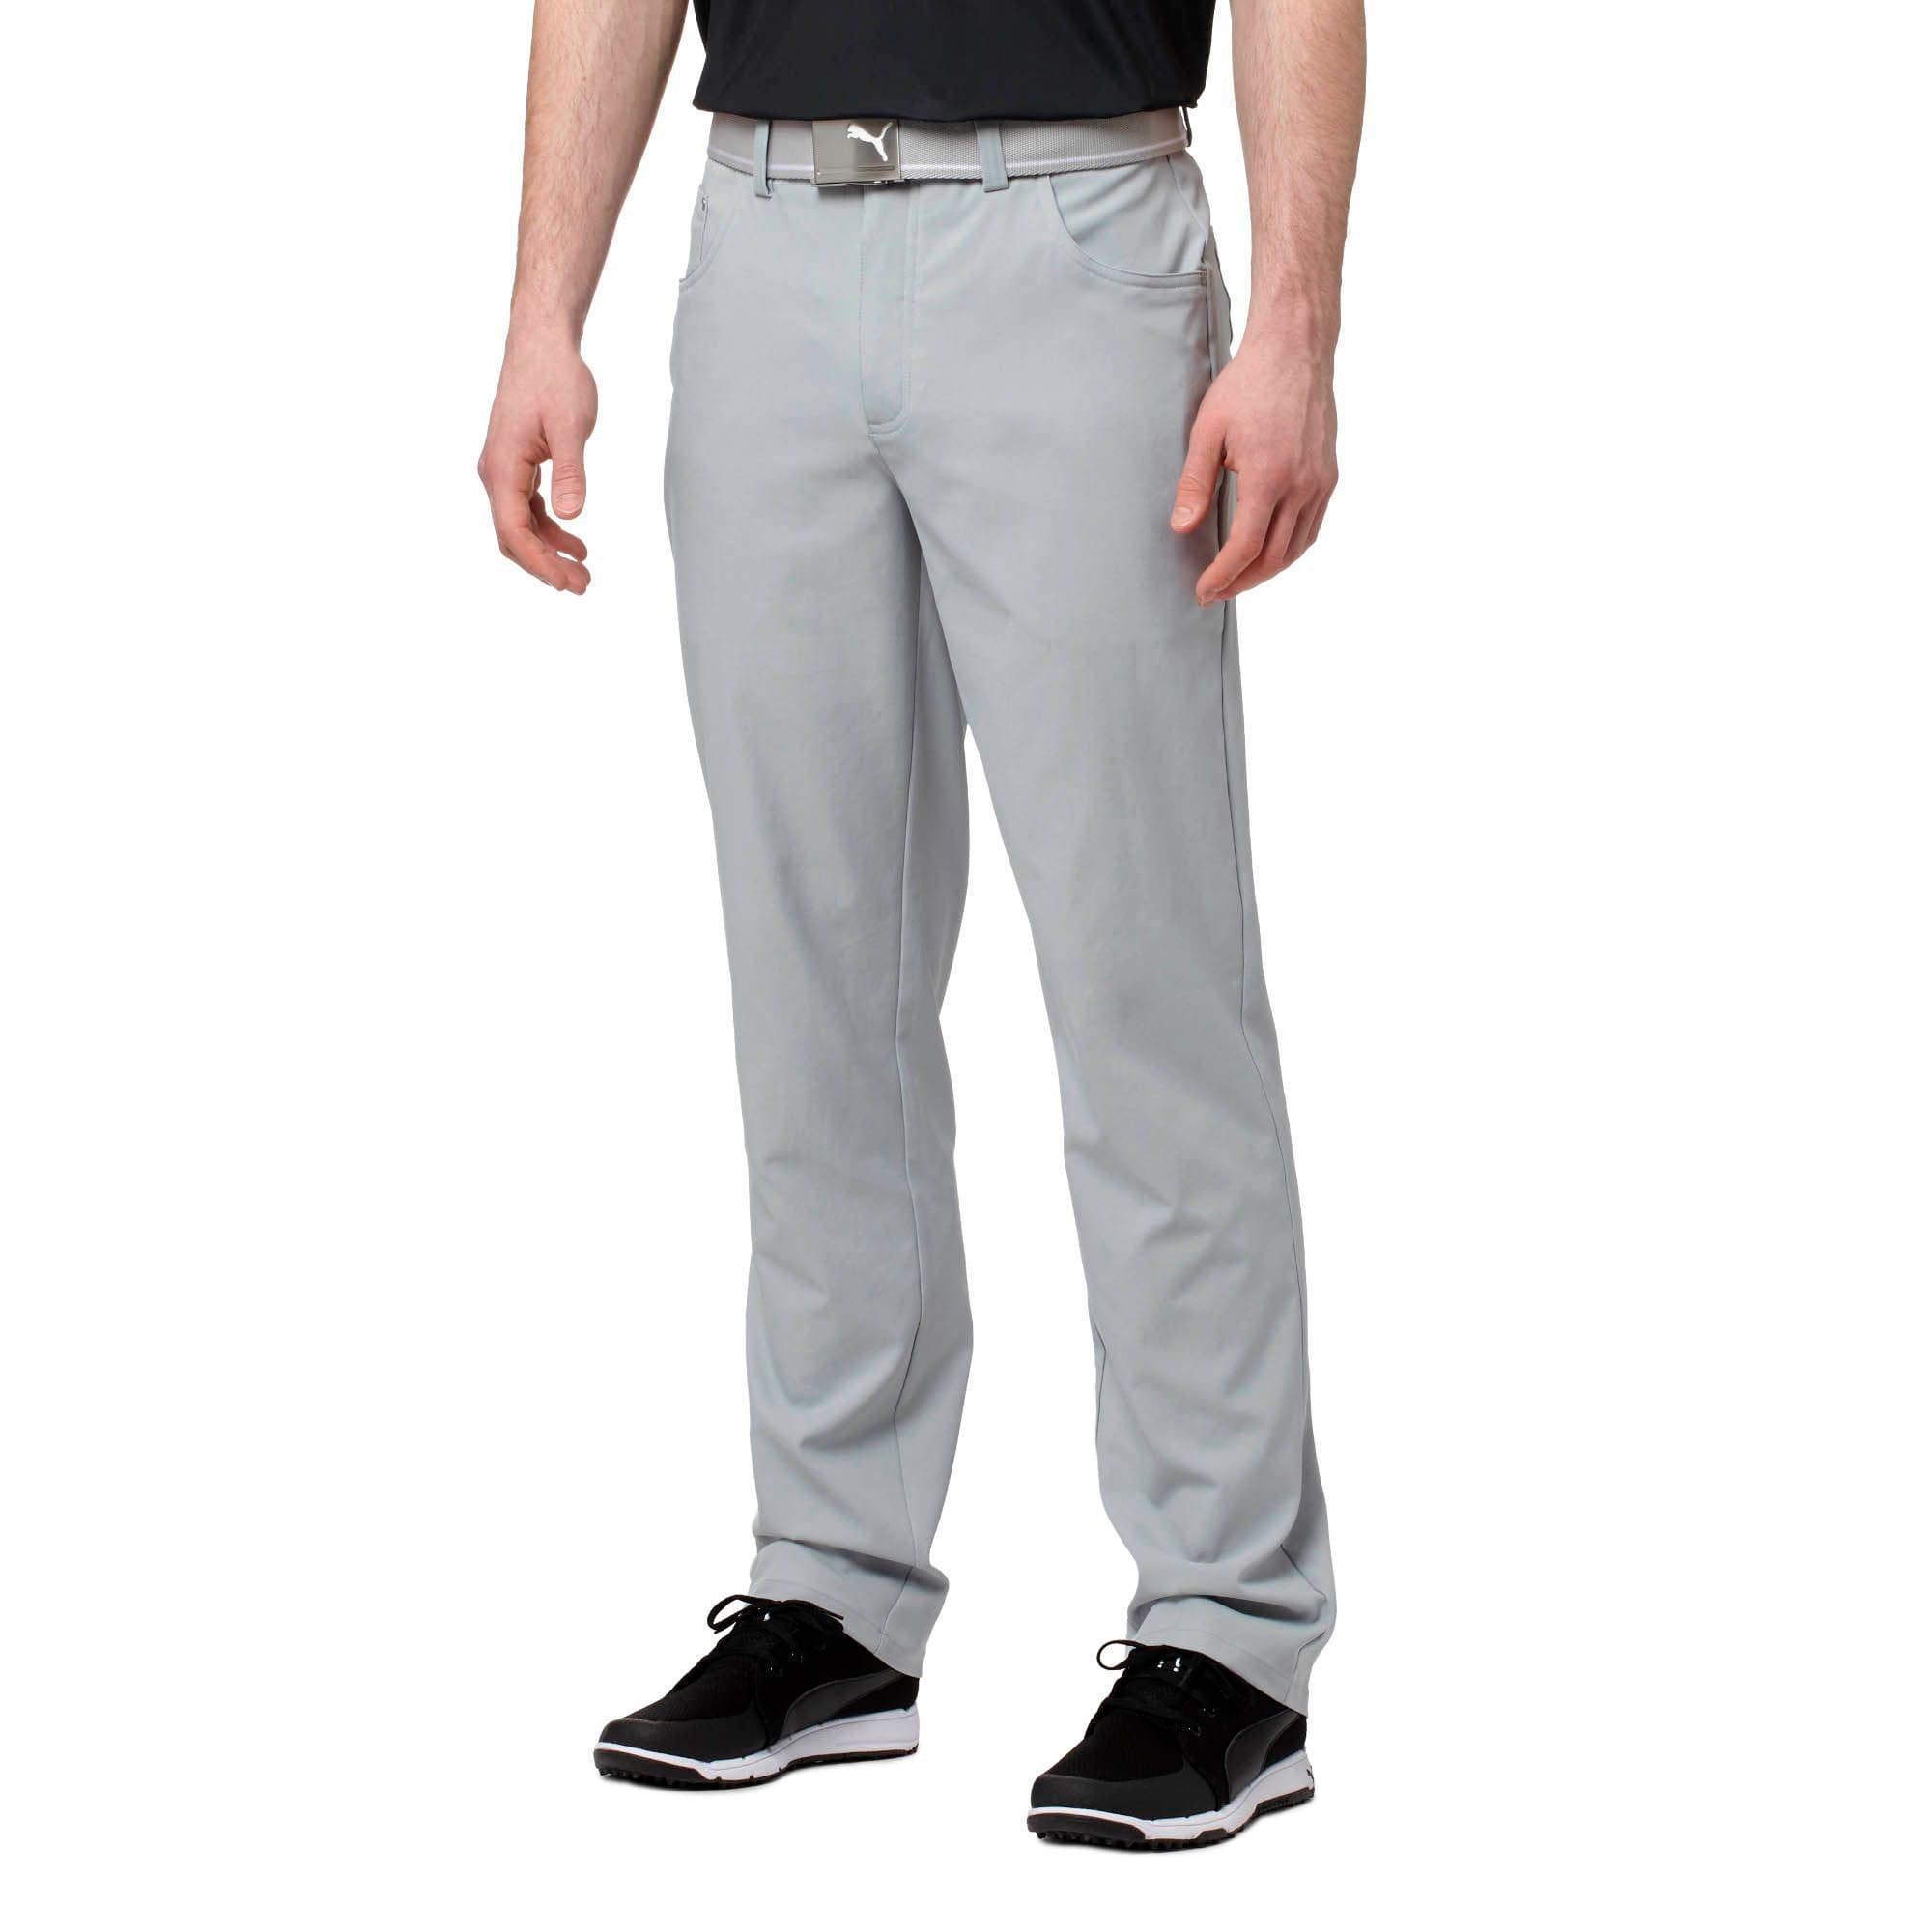 Thumbnail 2 of Men's 6 Pocket Pants, Quarry, medium